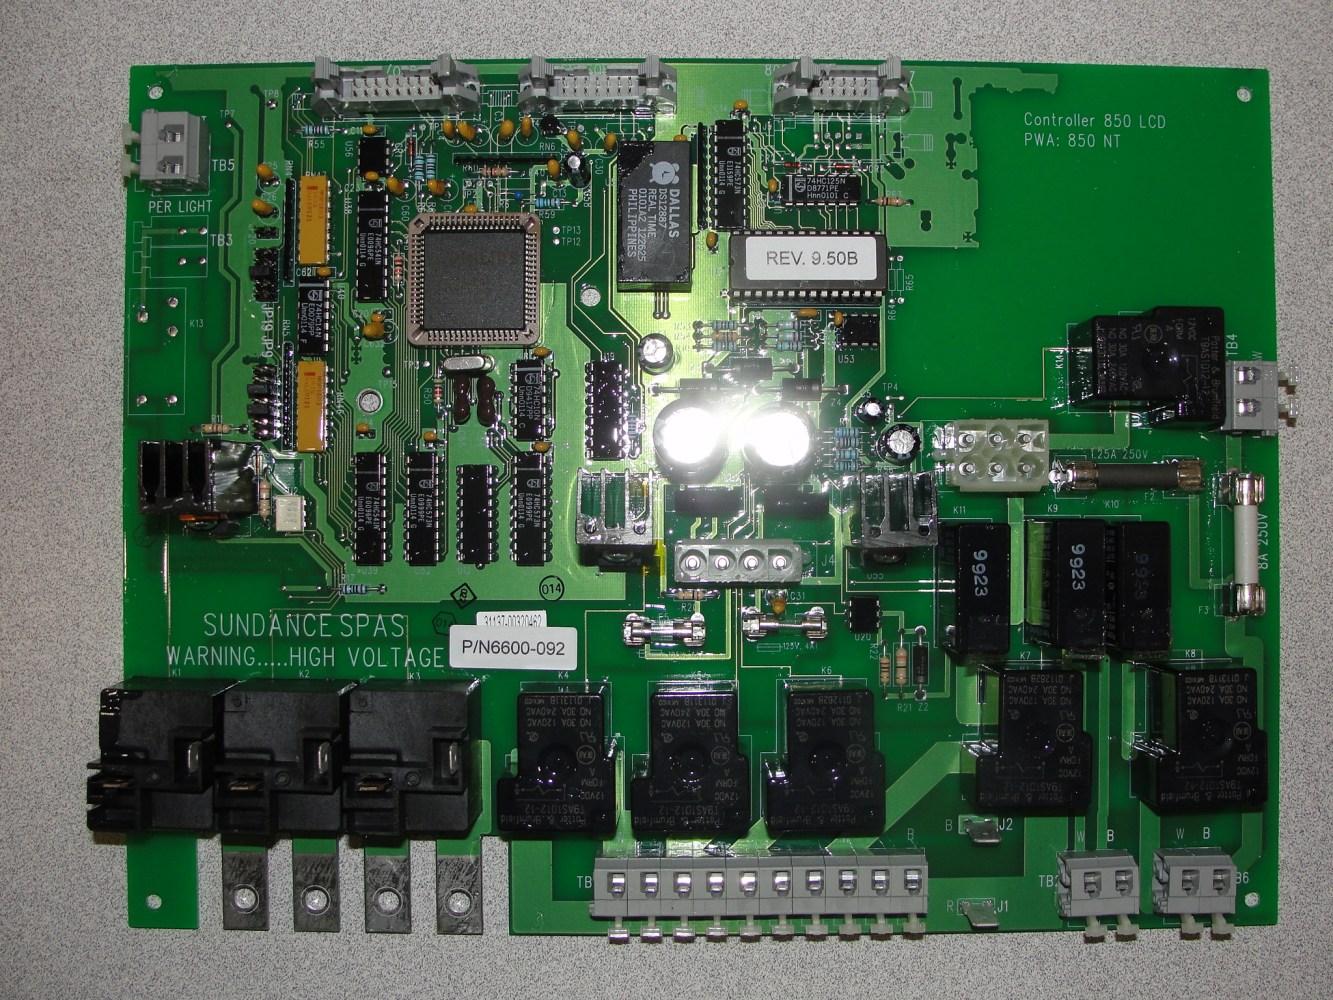 medium resolution of sundance spa jacuzzi spa circuit board 6600 092 a 1 spa control rh a1spacontrol com circuit